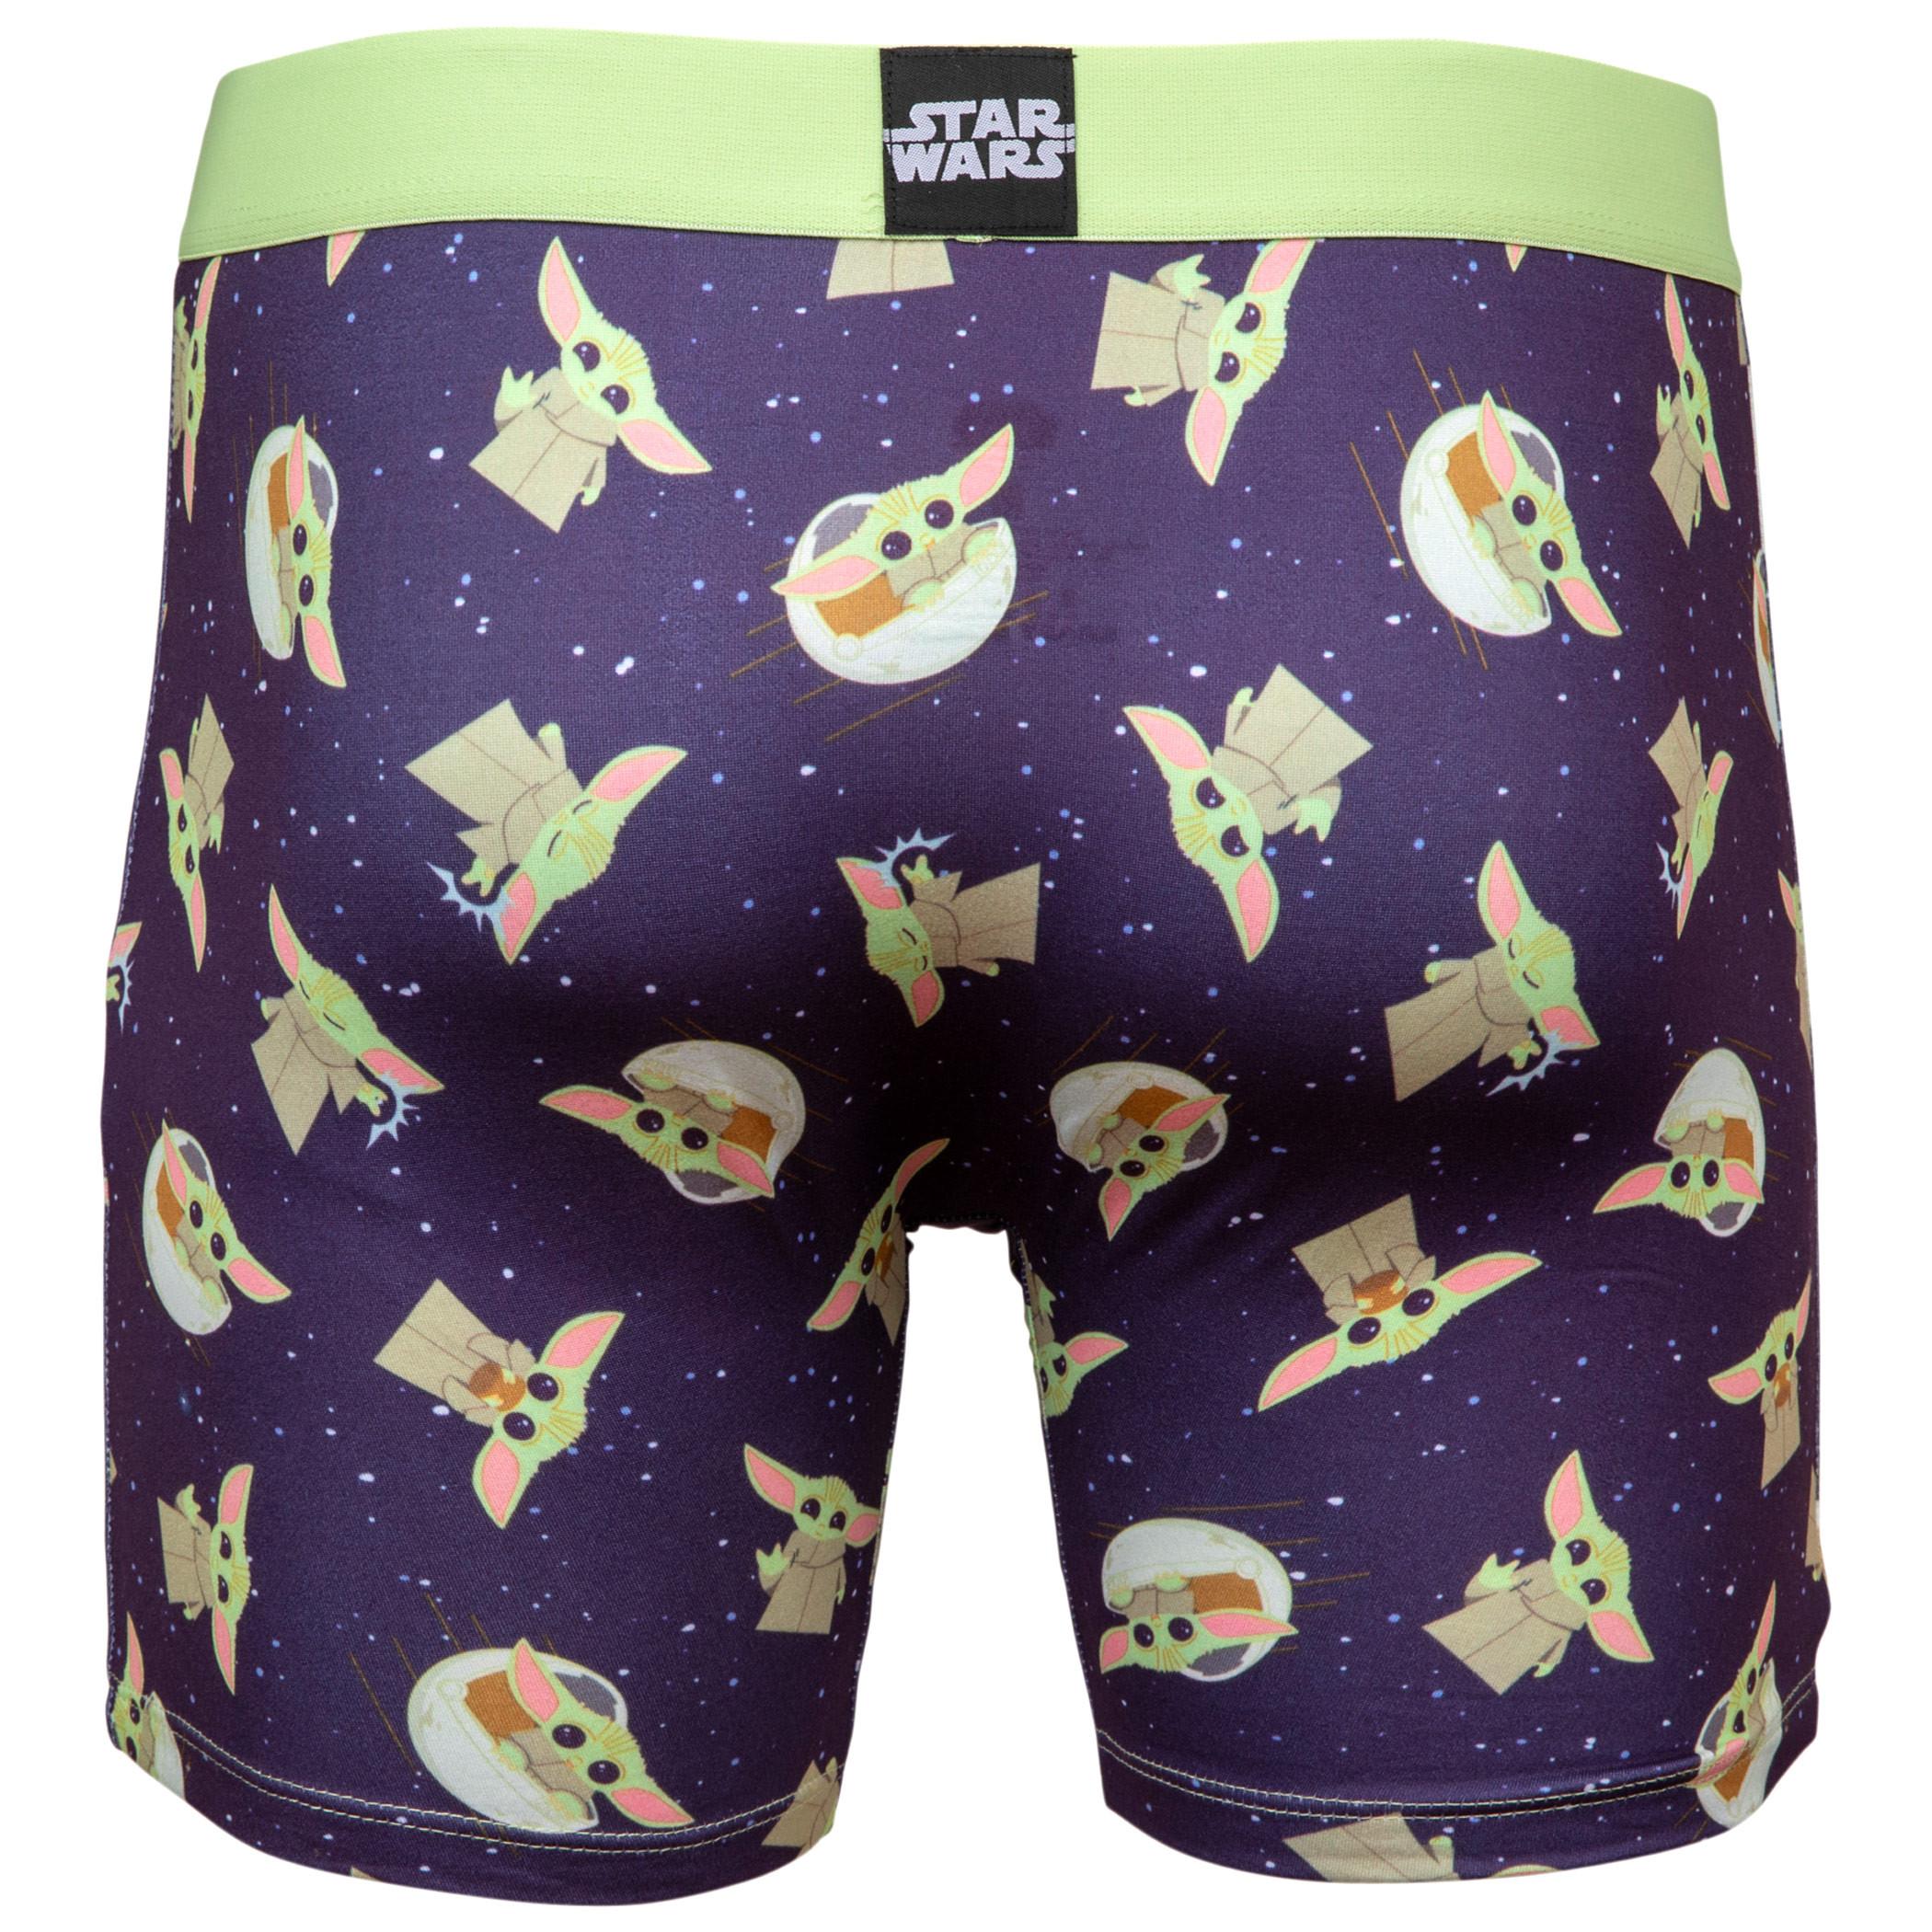 Star Wars The Mandalorian The Child Men's Boxer Briefs Shorts